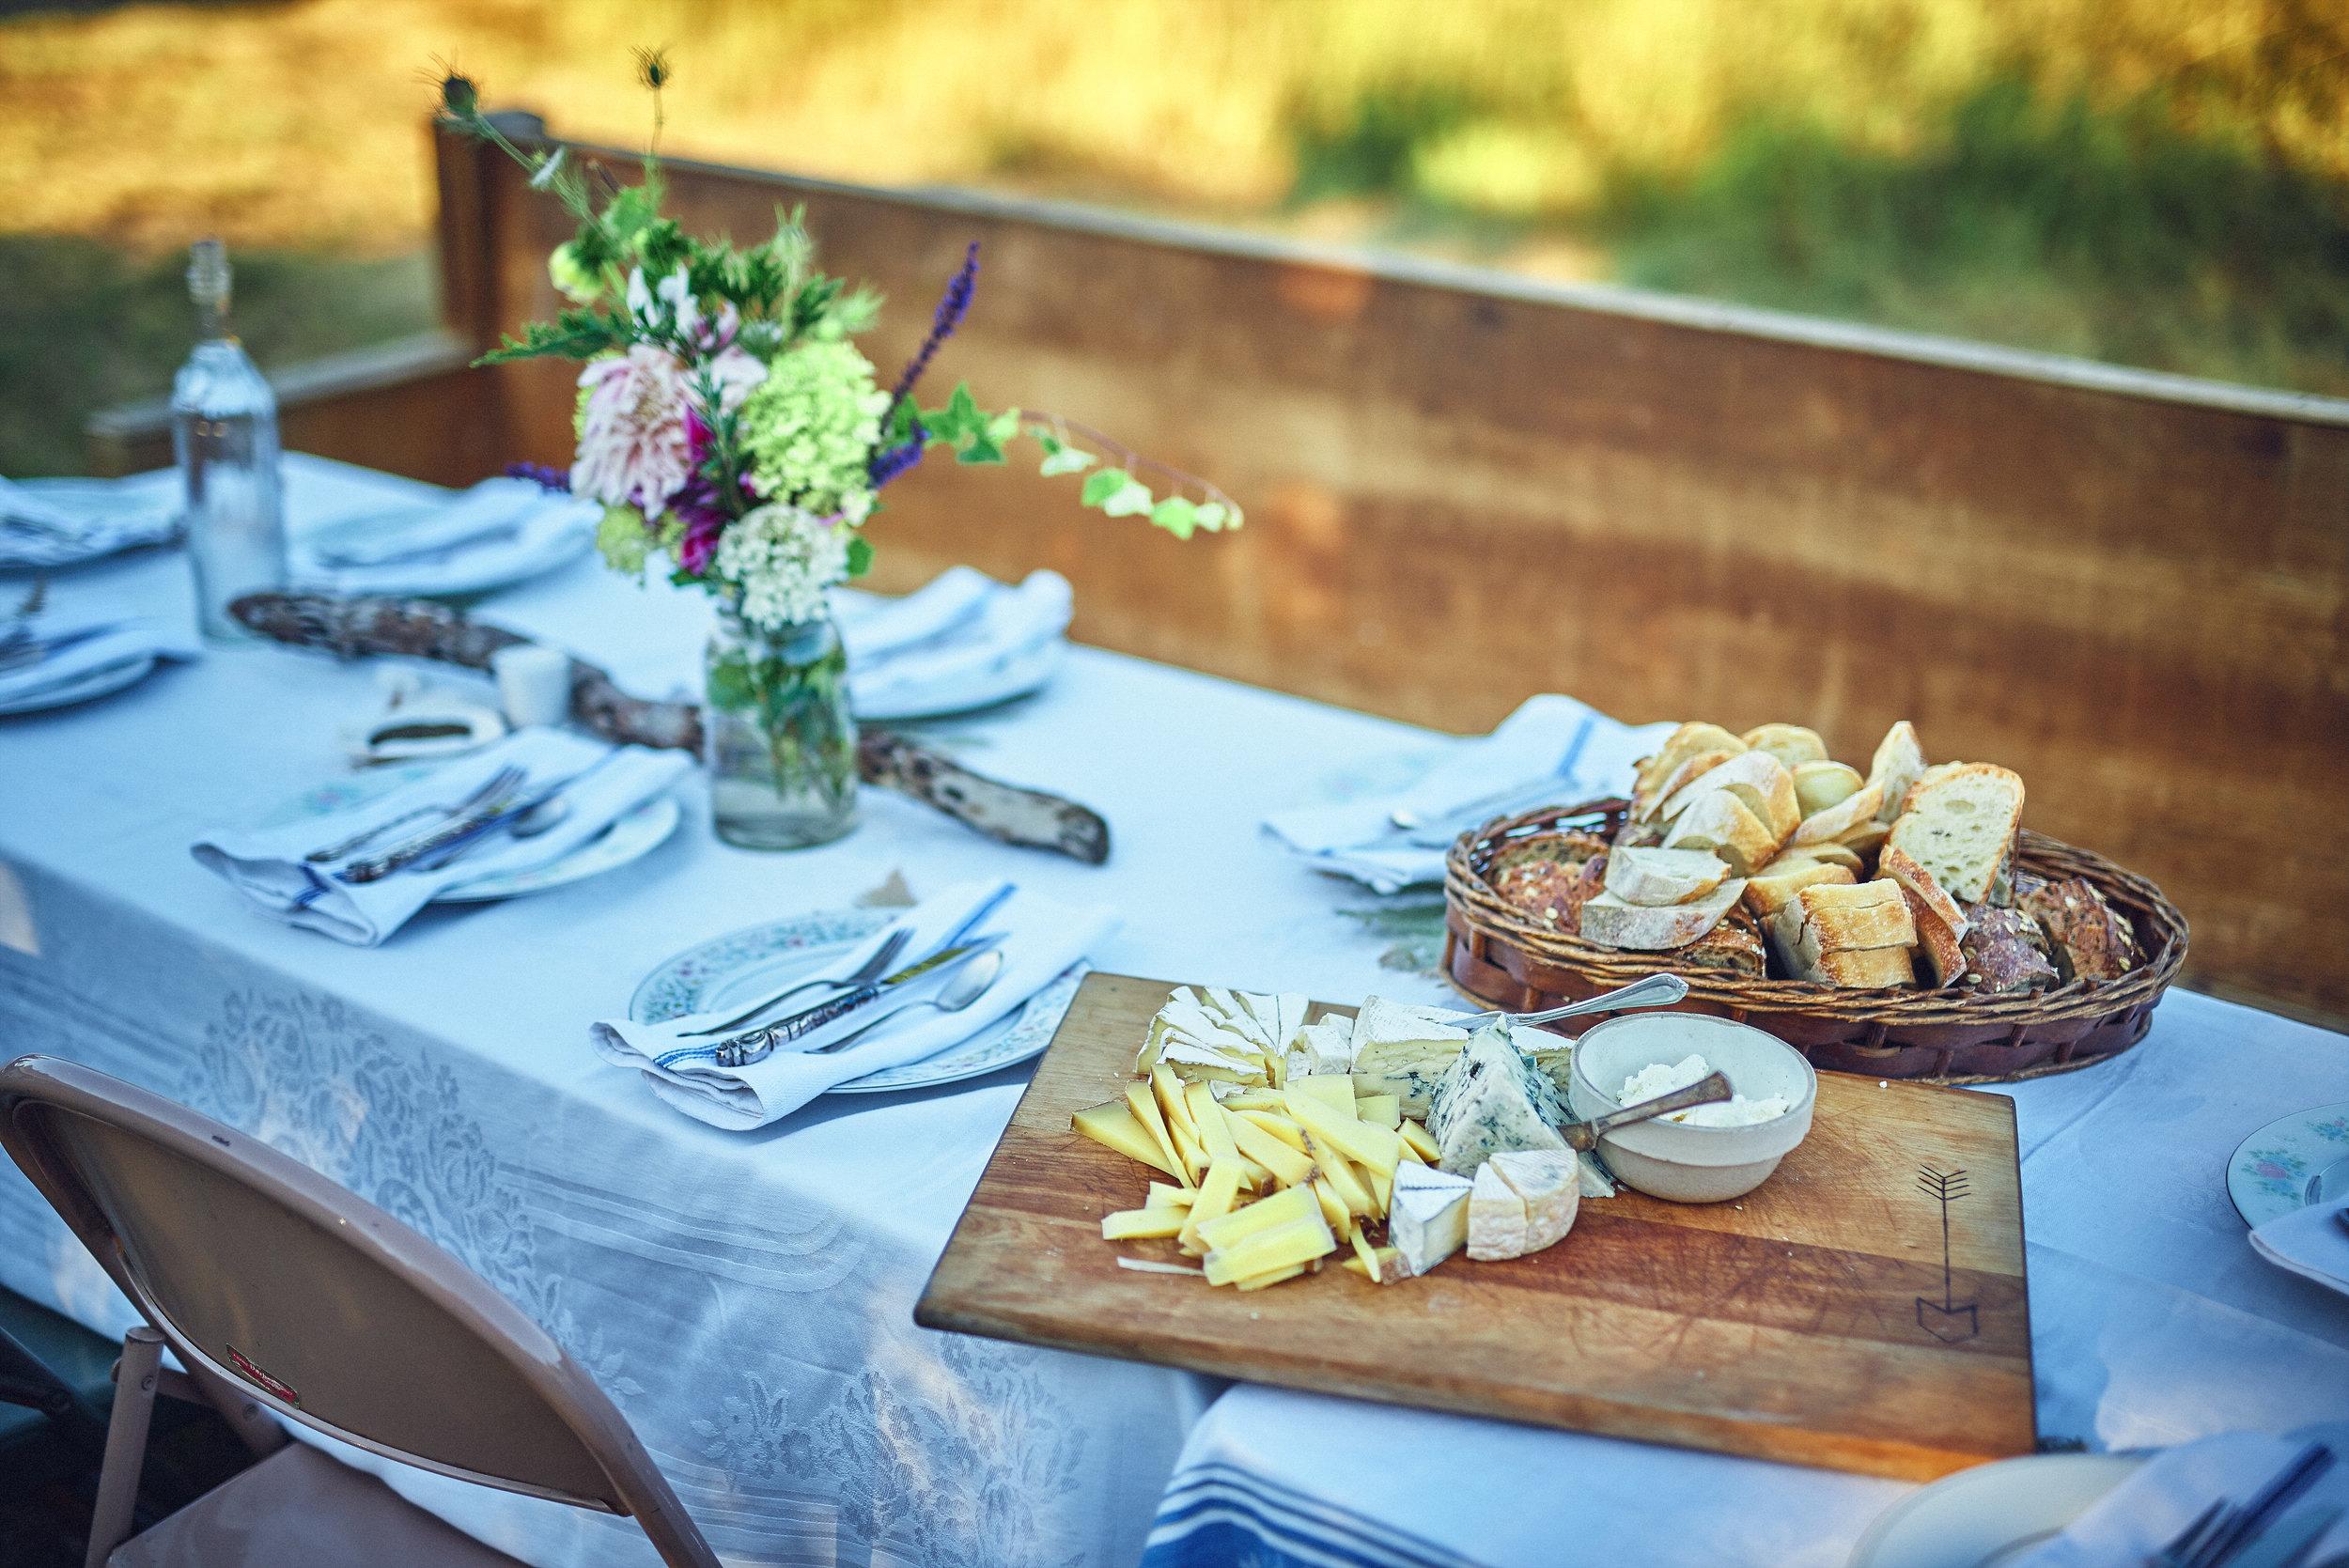 table setting bread and cheese church pew at plum nelli farm wedding.jpg